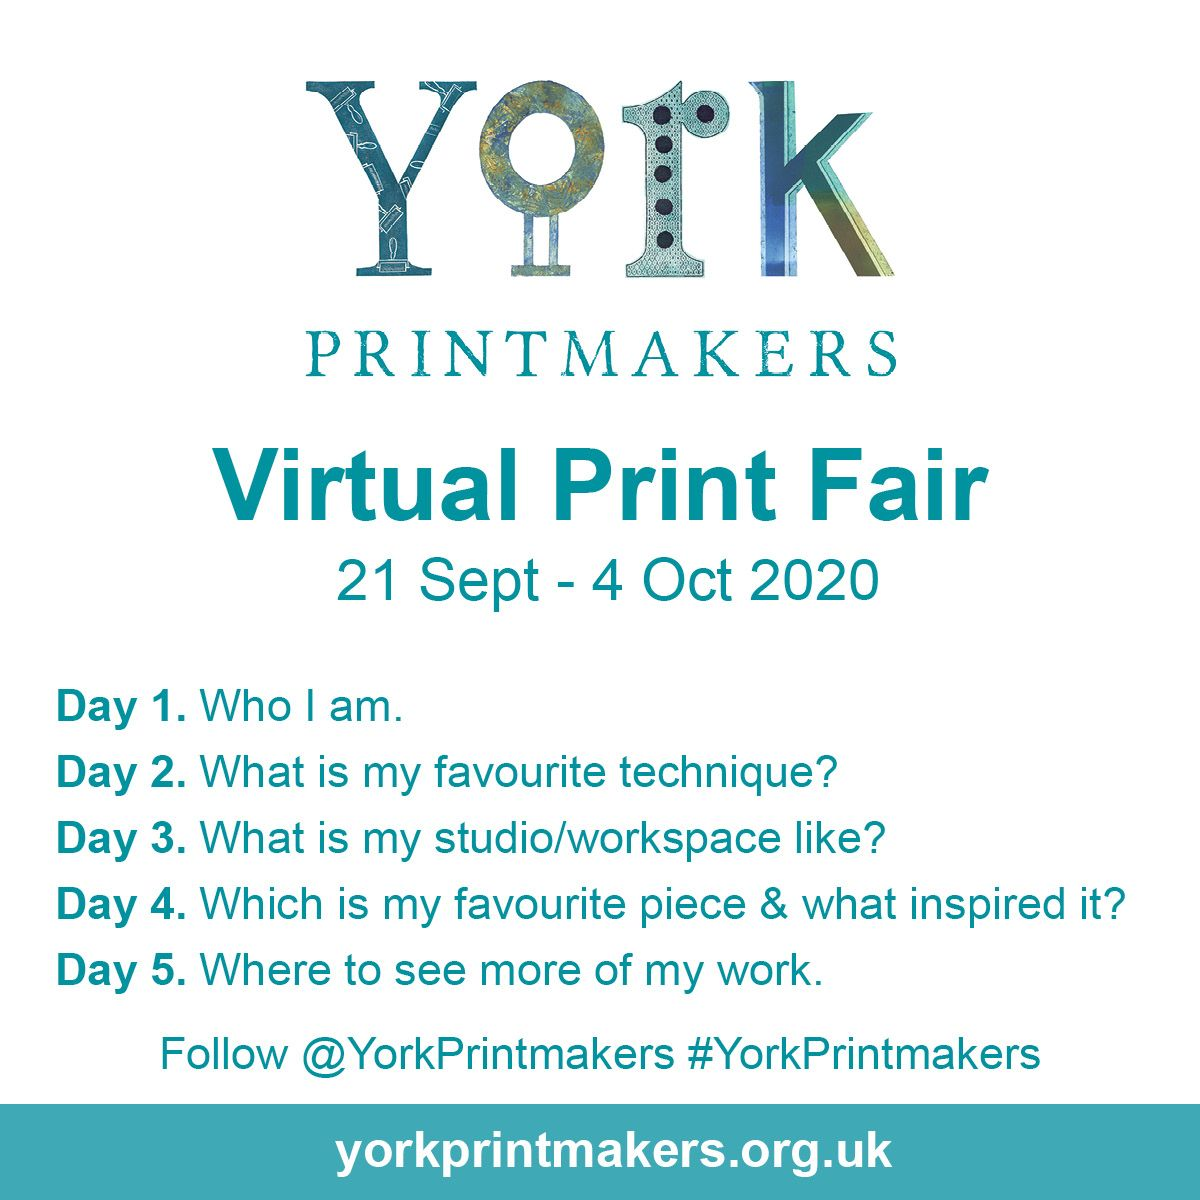 The programme for the virtual fair